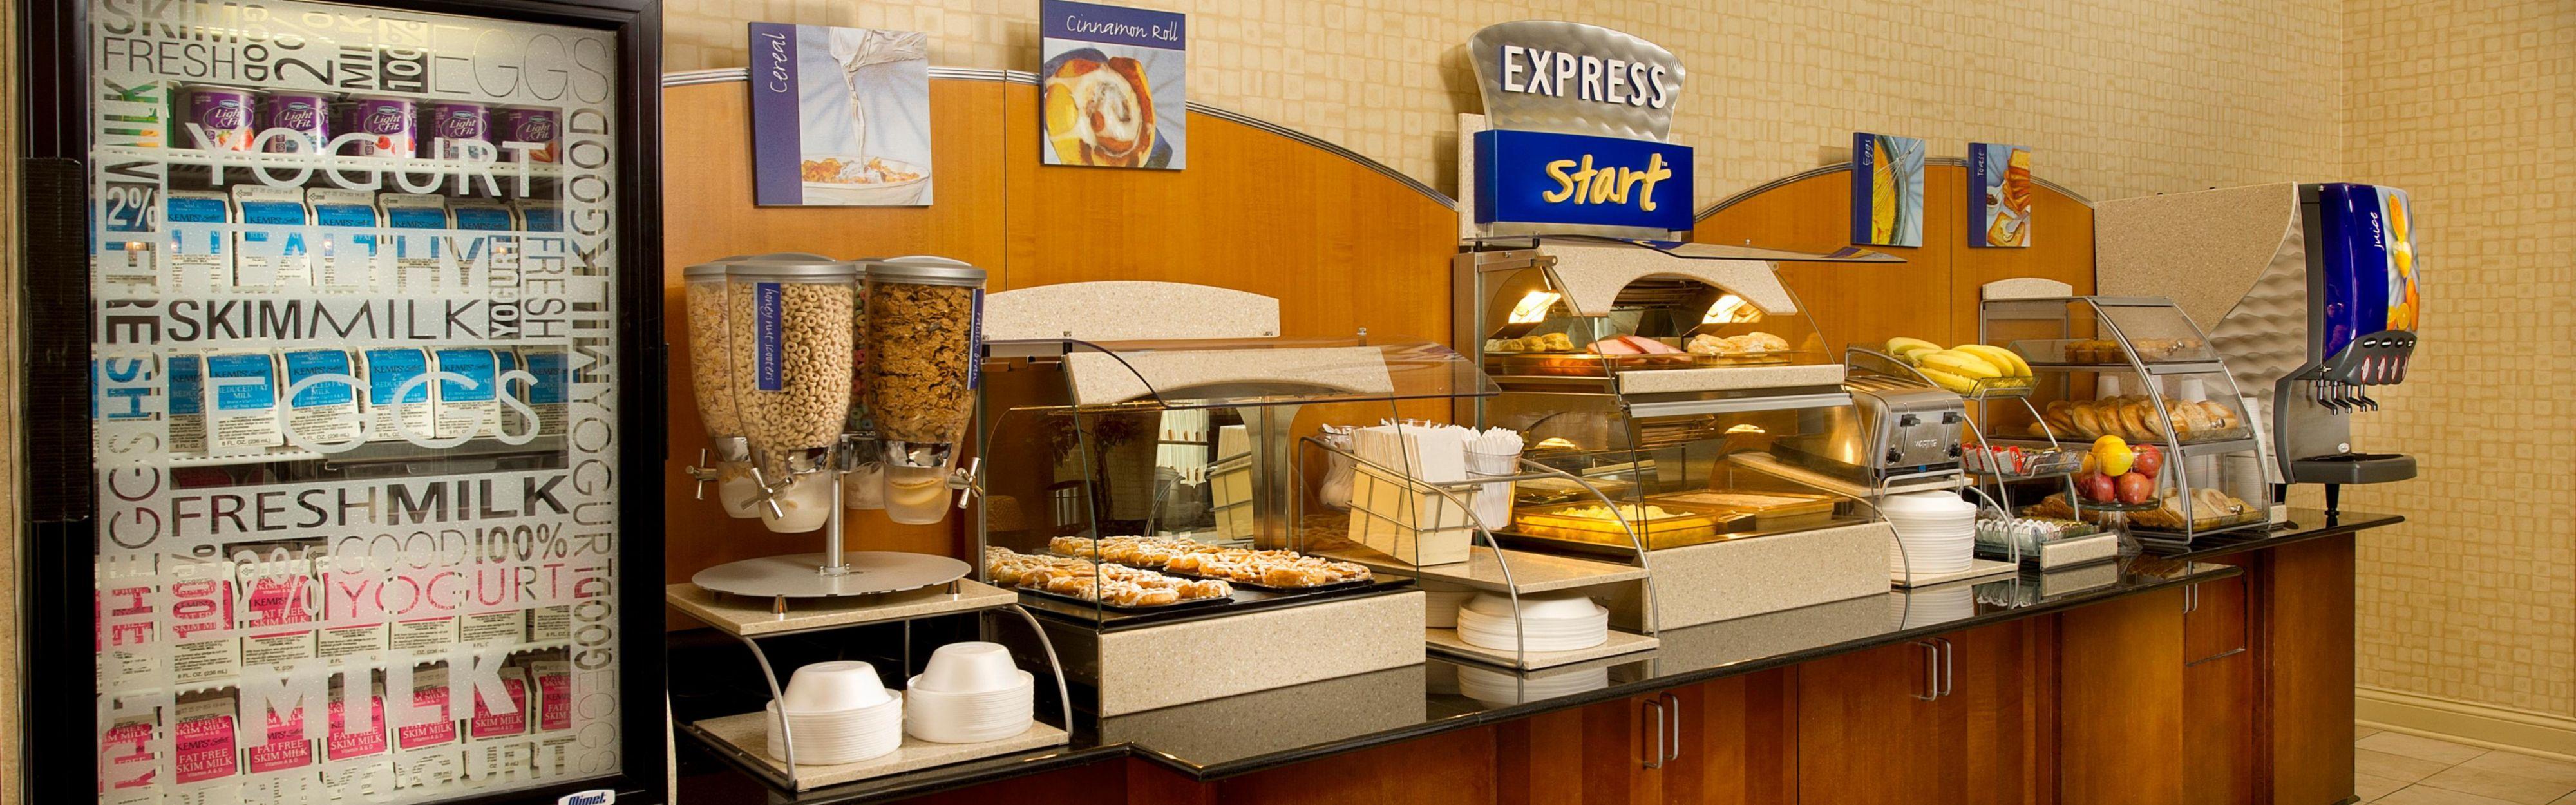 Holiday Inn Express & Suites Schererville image 3